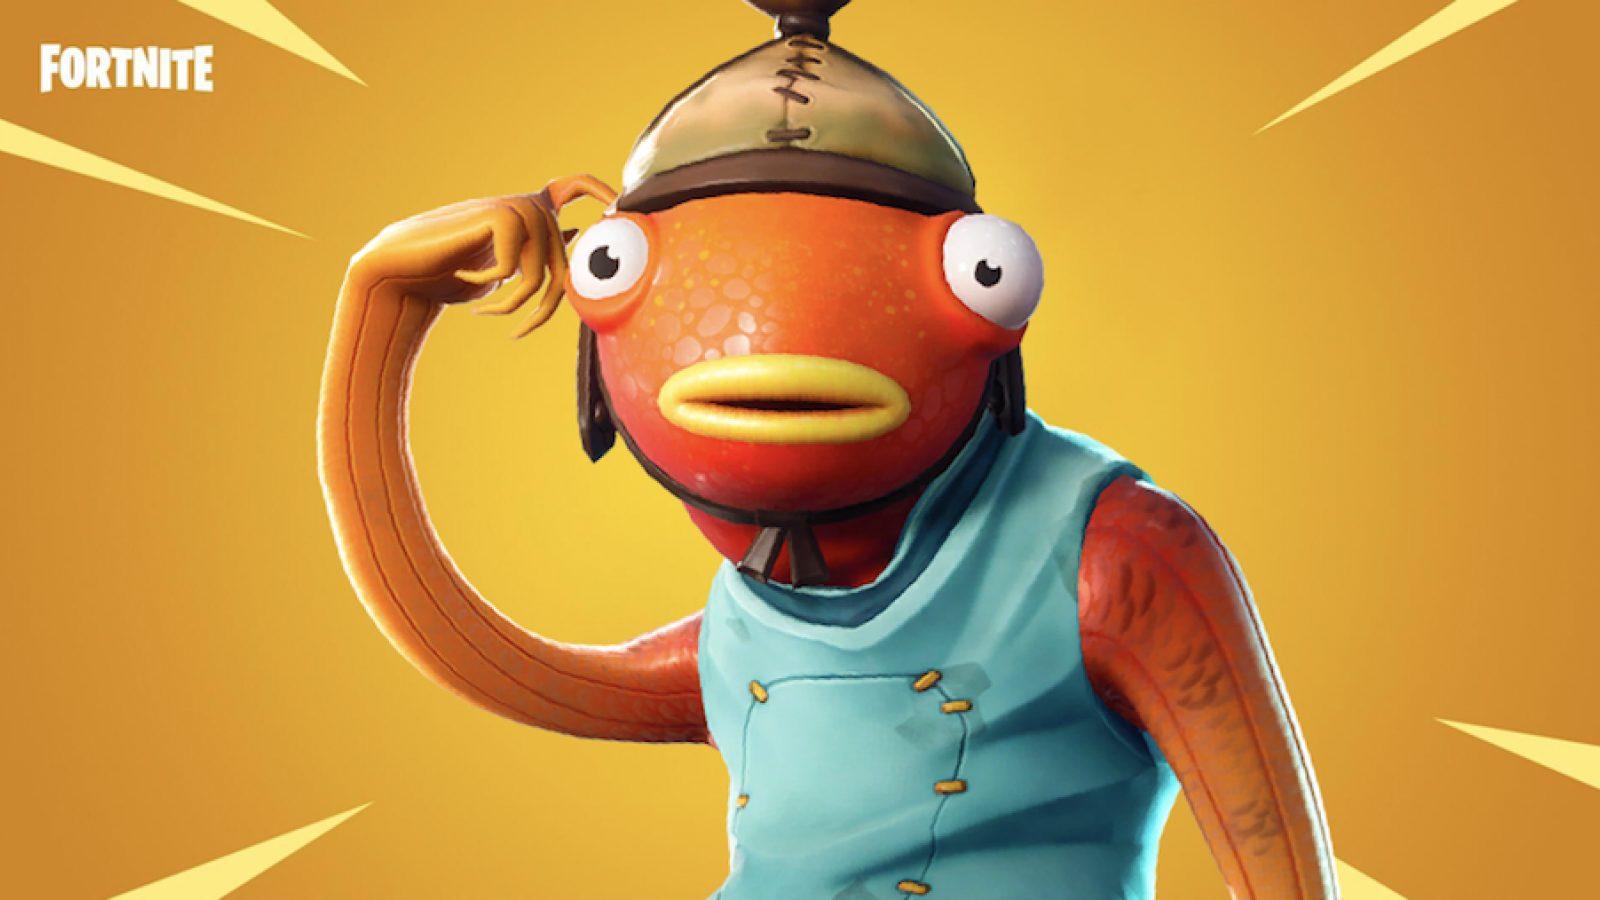 New Fortnite Leak Features Unreleased Ninja And Female Fishstick Skins Dot Esports